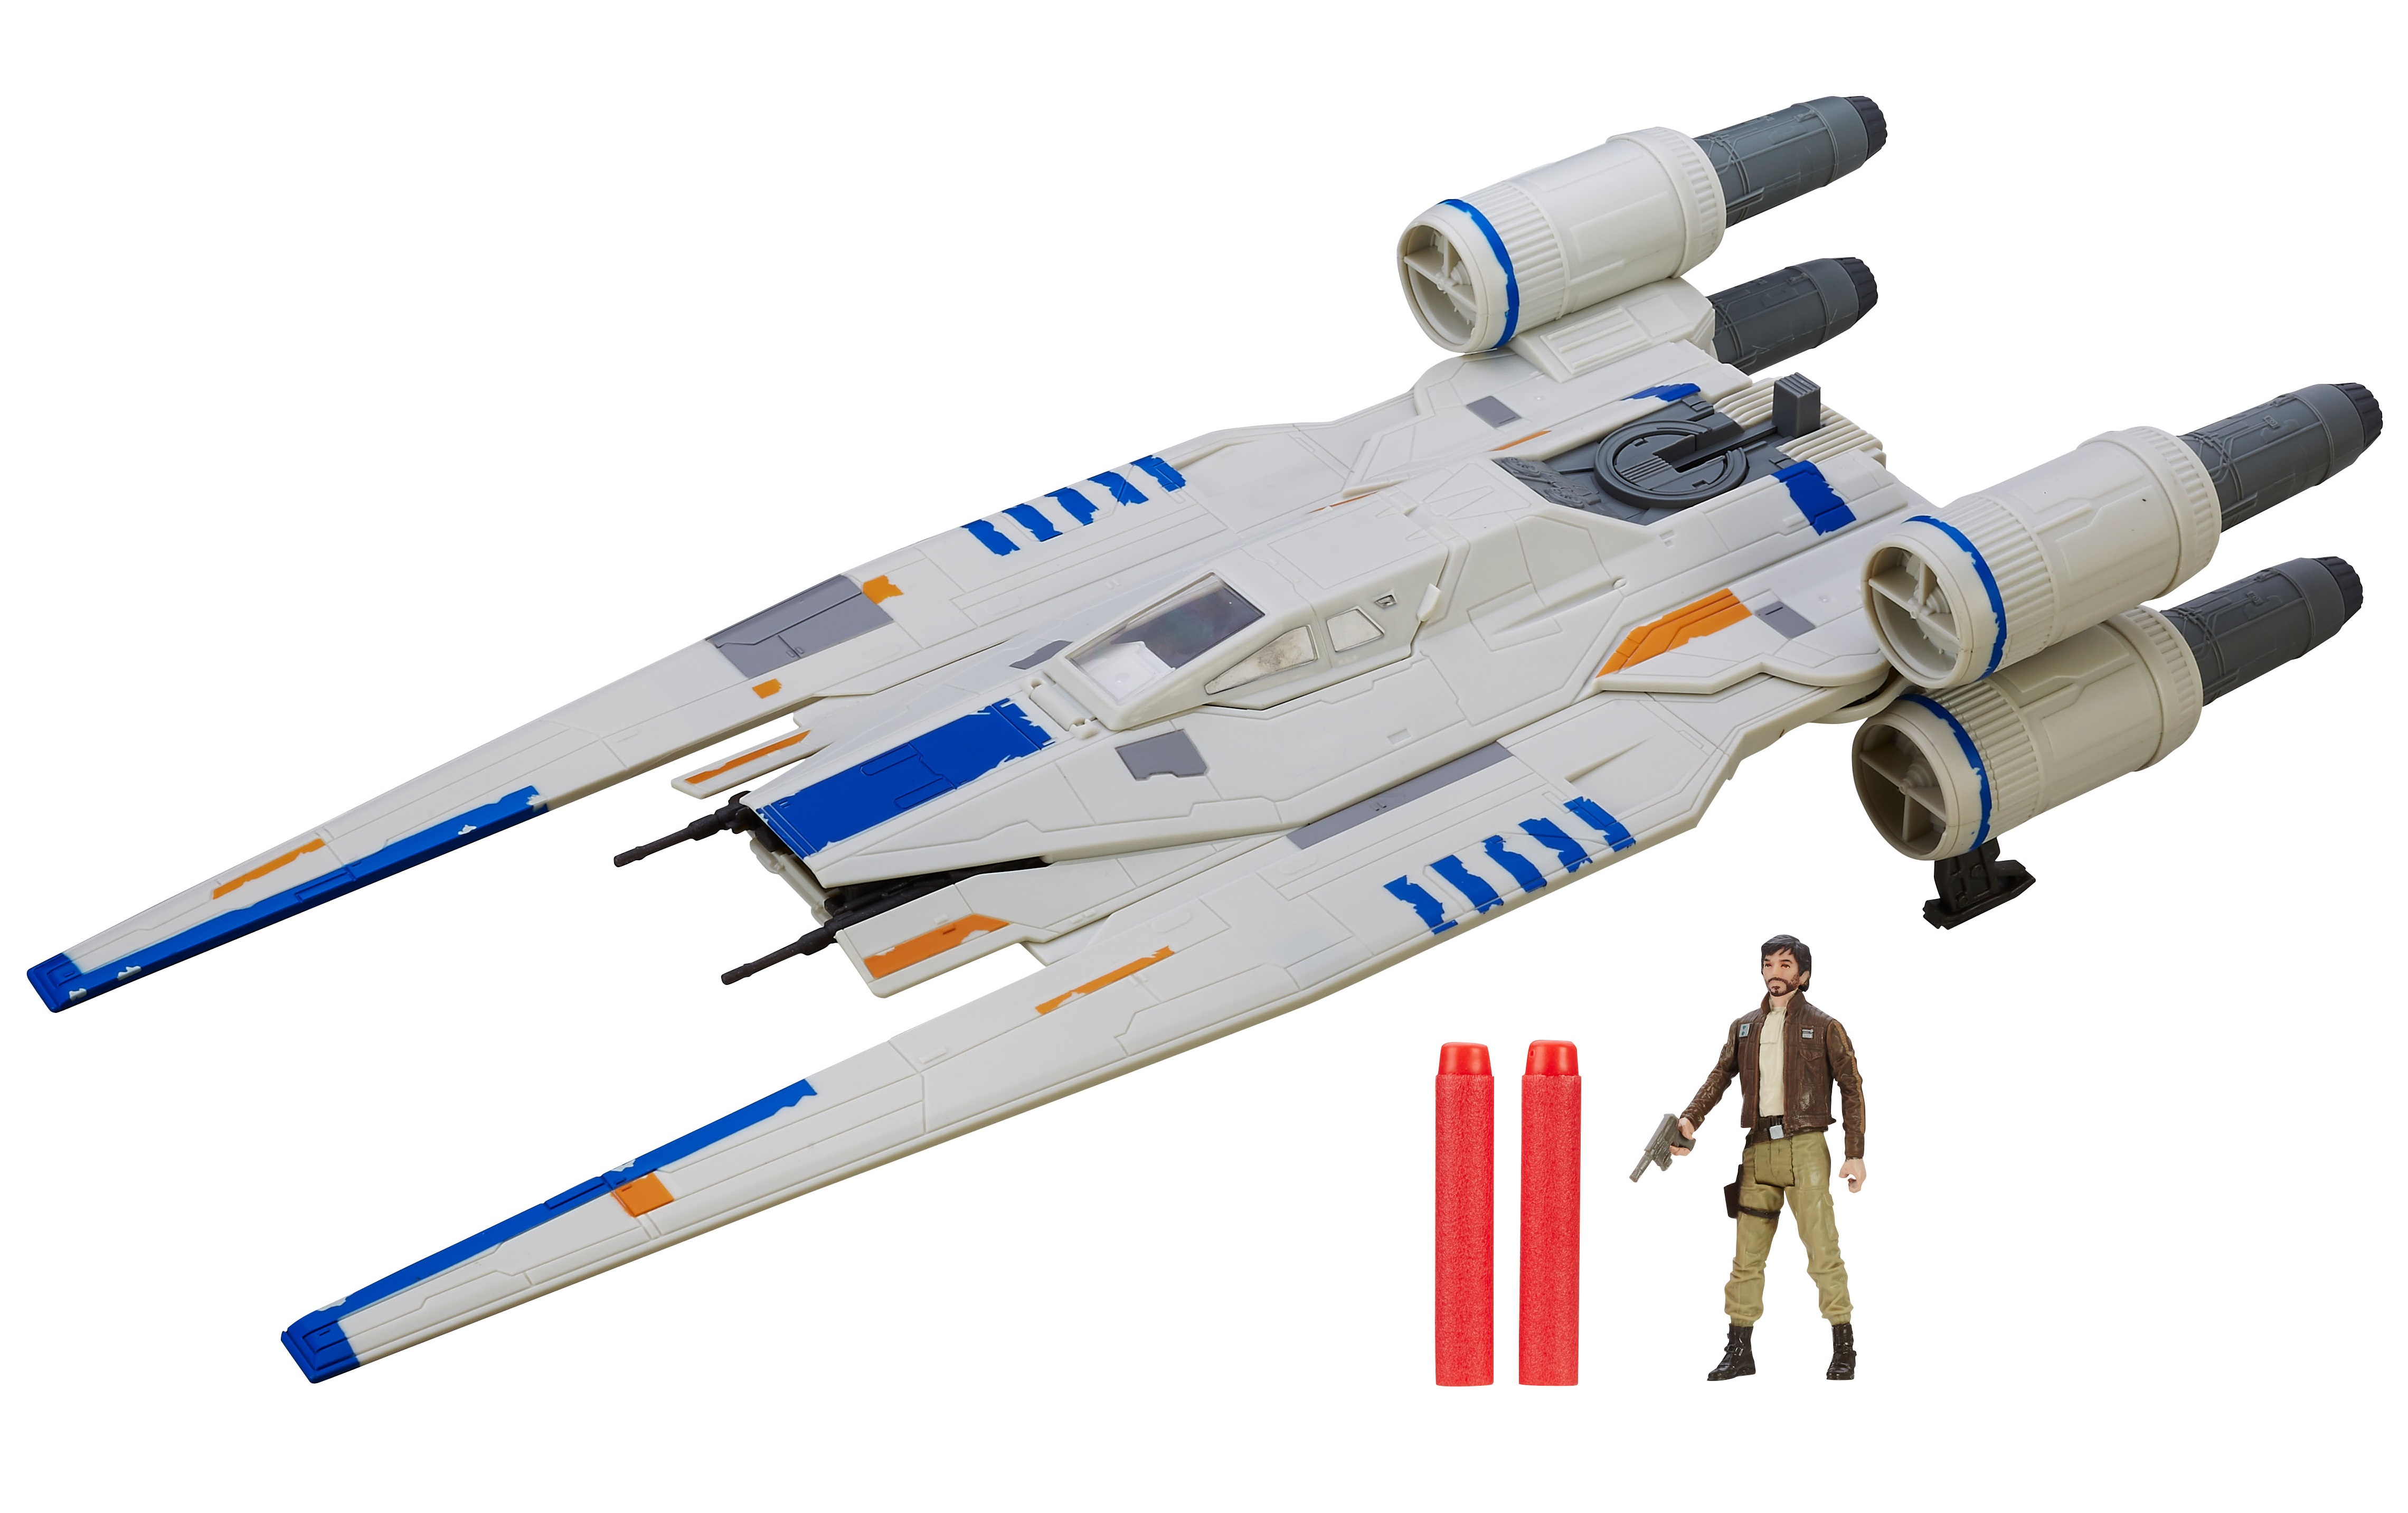 Nerf Star Wars Rogue One 3.75-inch Rebel U-Wing Fighter ($49.99)